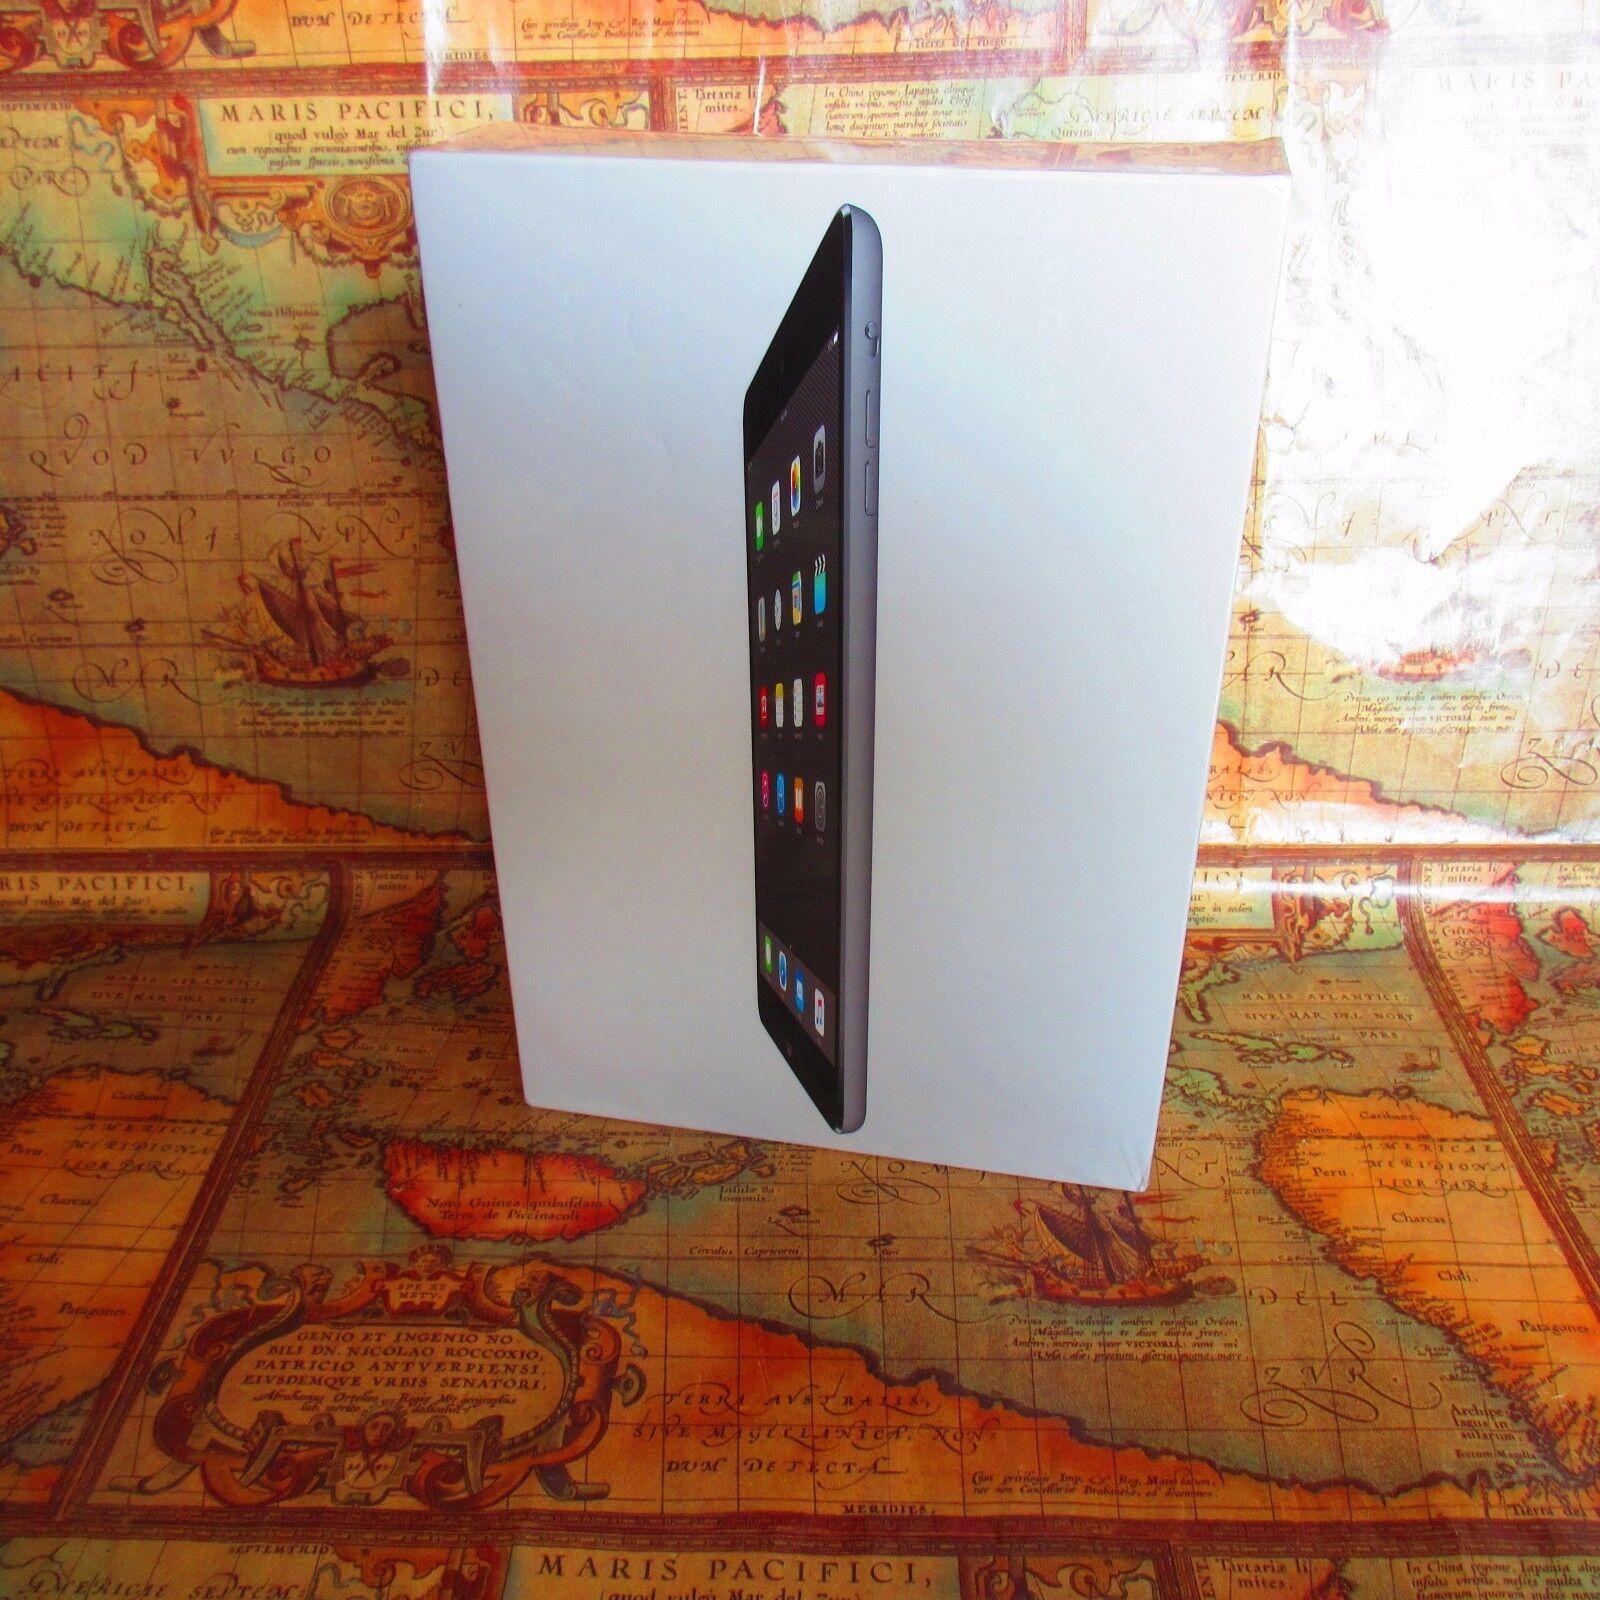 Apple iPad Mini (2nd gen) from jrlelectronicshub